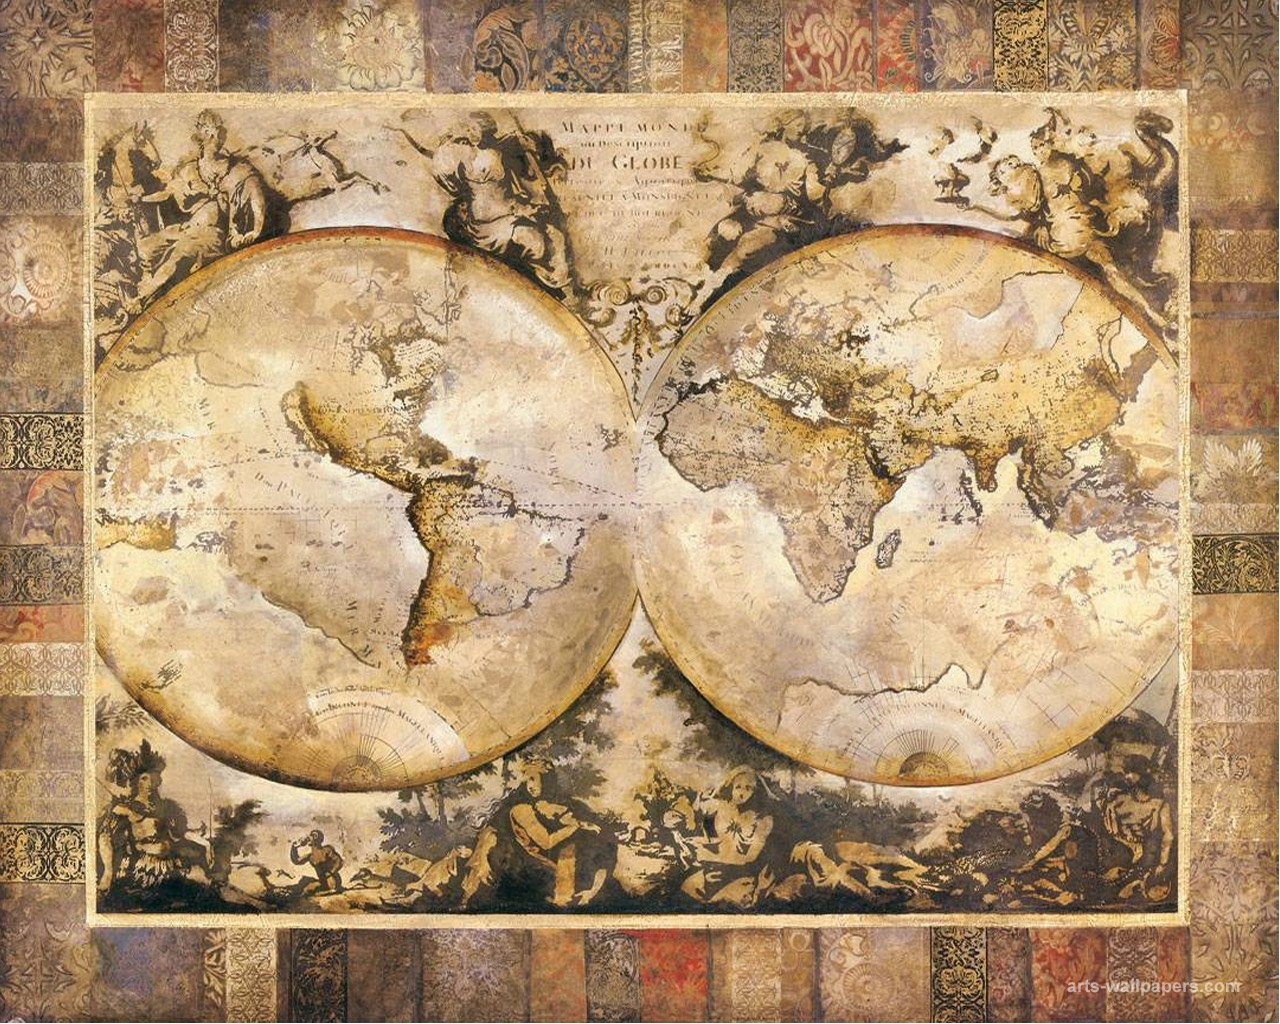 Old world map desktop wallpaper wallpapersafari kootationcomworld egypt temple hd wallpaper desktop backgroundhtml 1280x1024 gumiabroncs Images